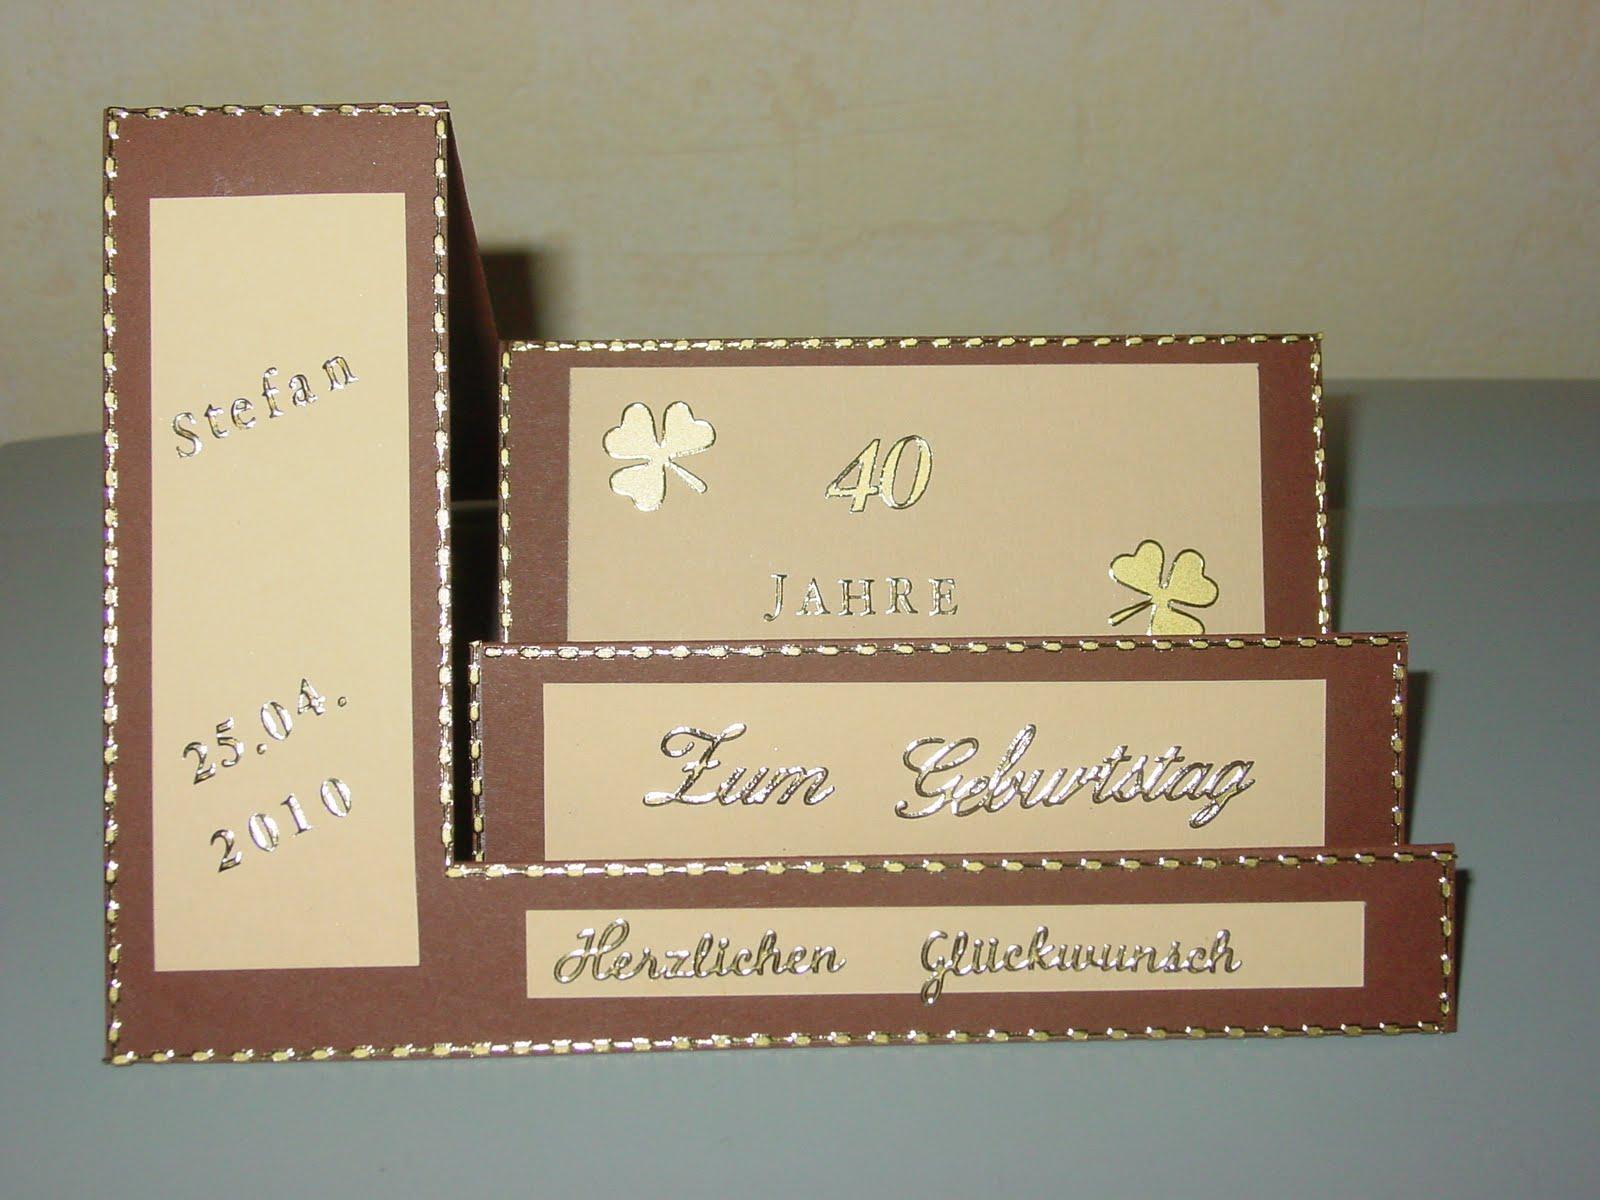 Geburtstagskarte basteln mann for Geburtstagskarte basteln mann